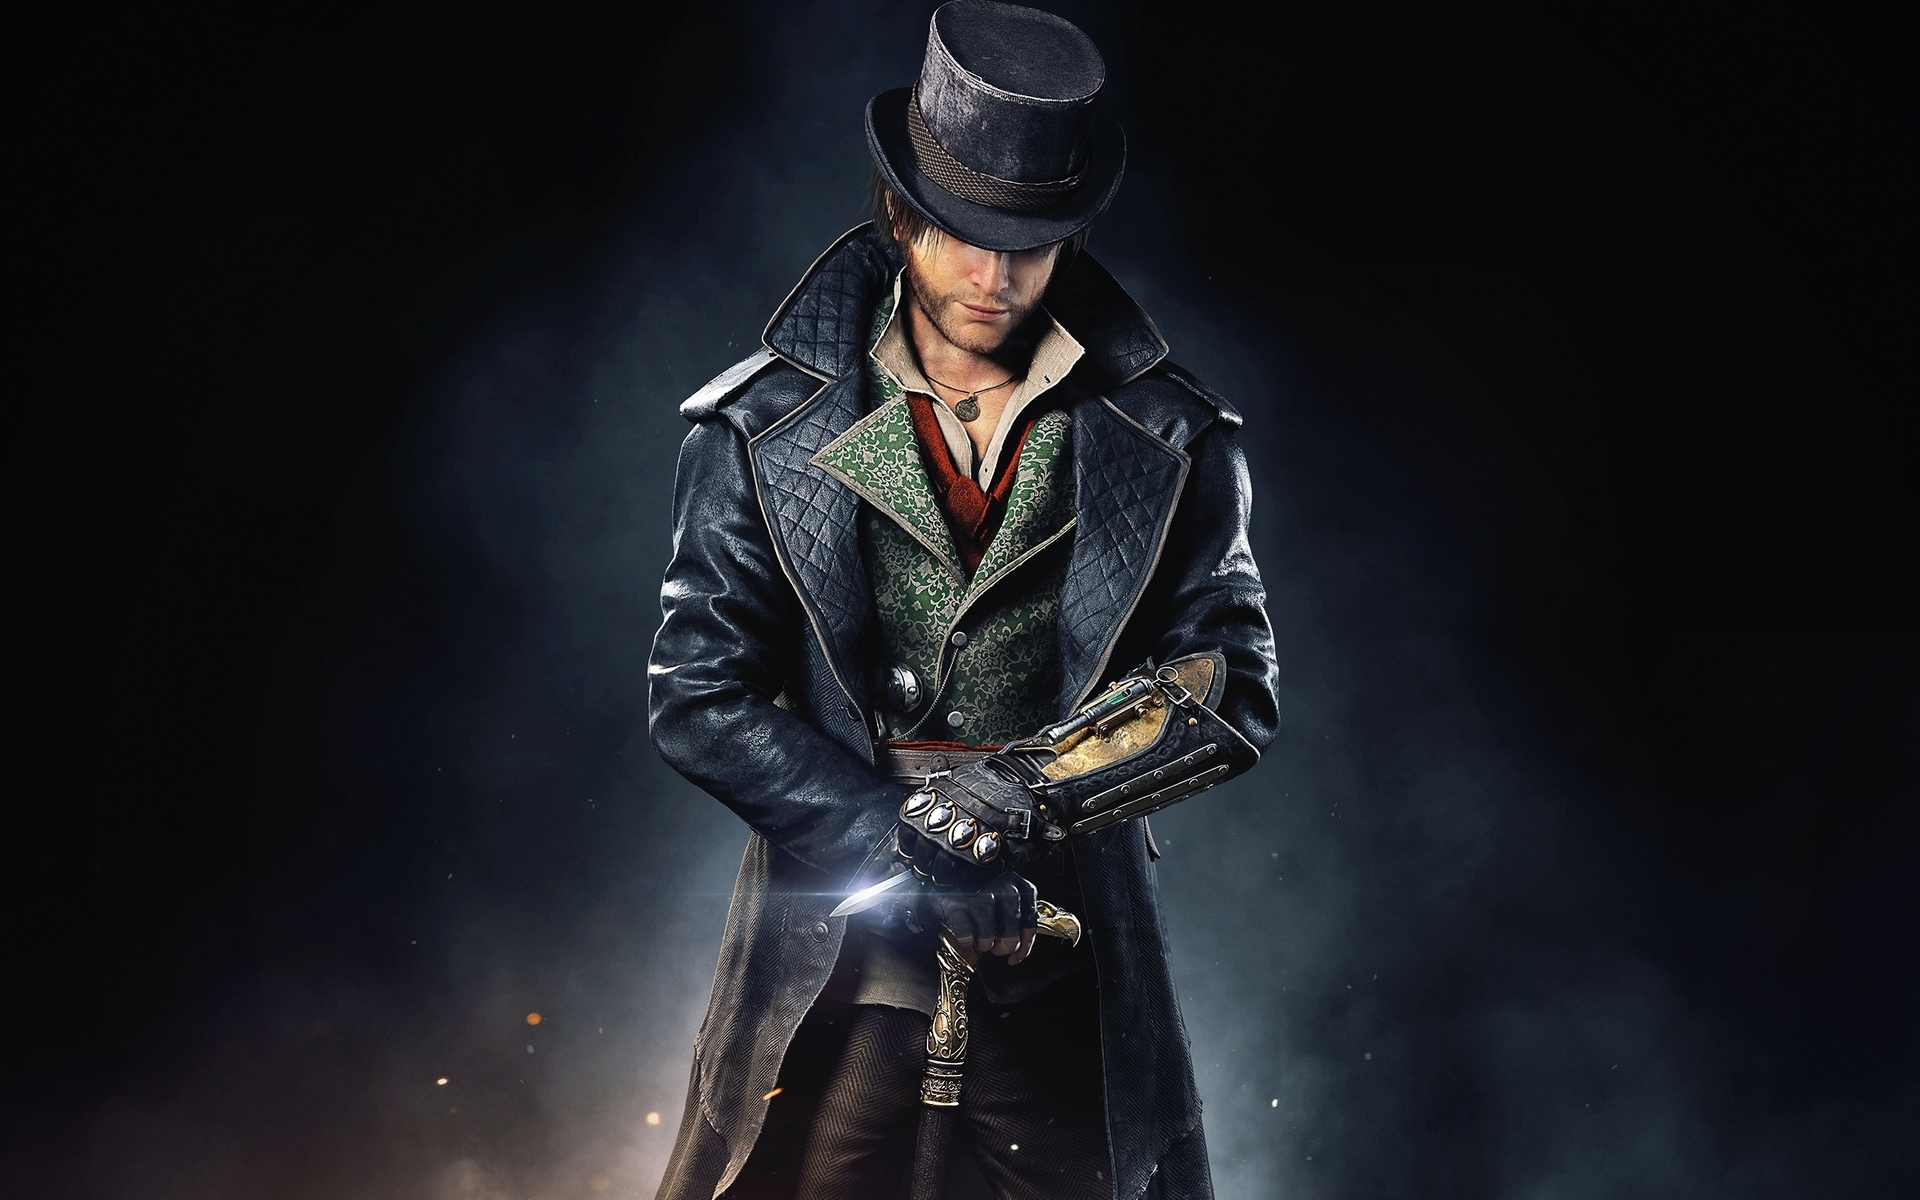 Assassins Creed Syndicate Hd Wallpaper Wallpaperfx